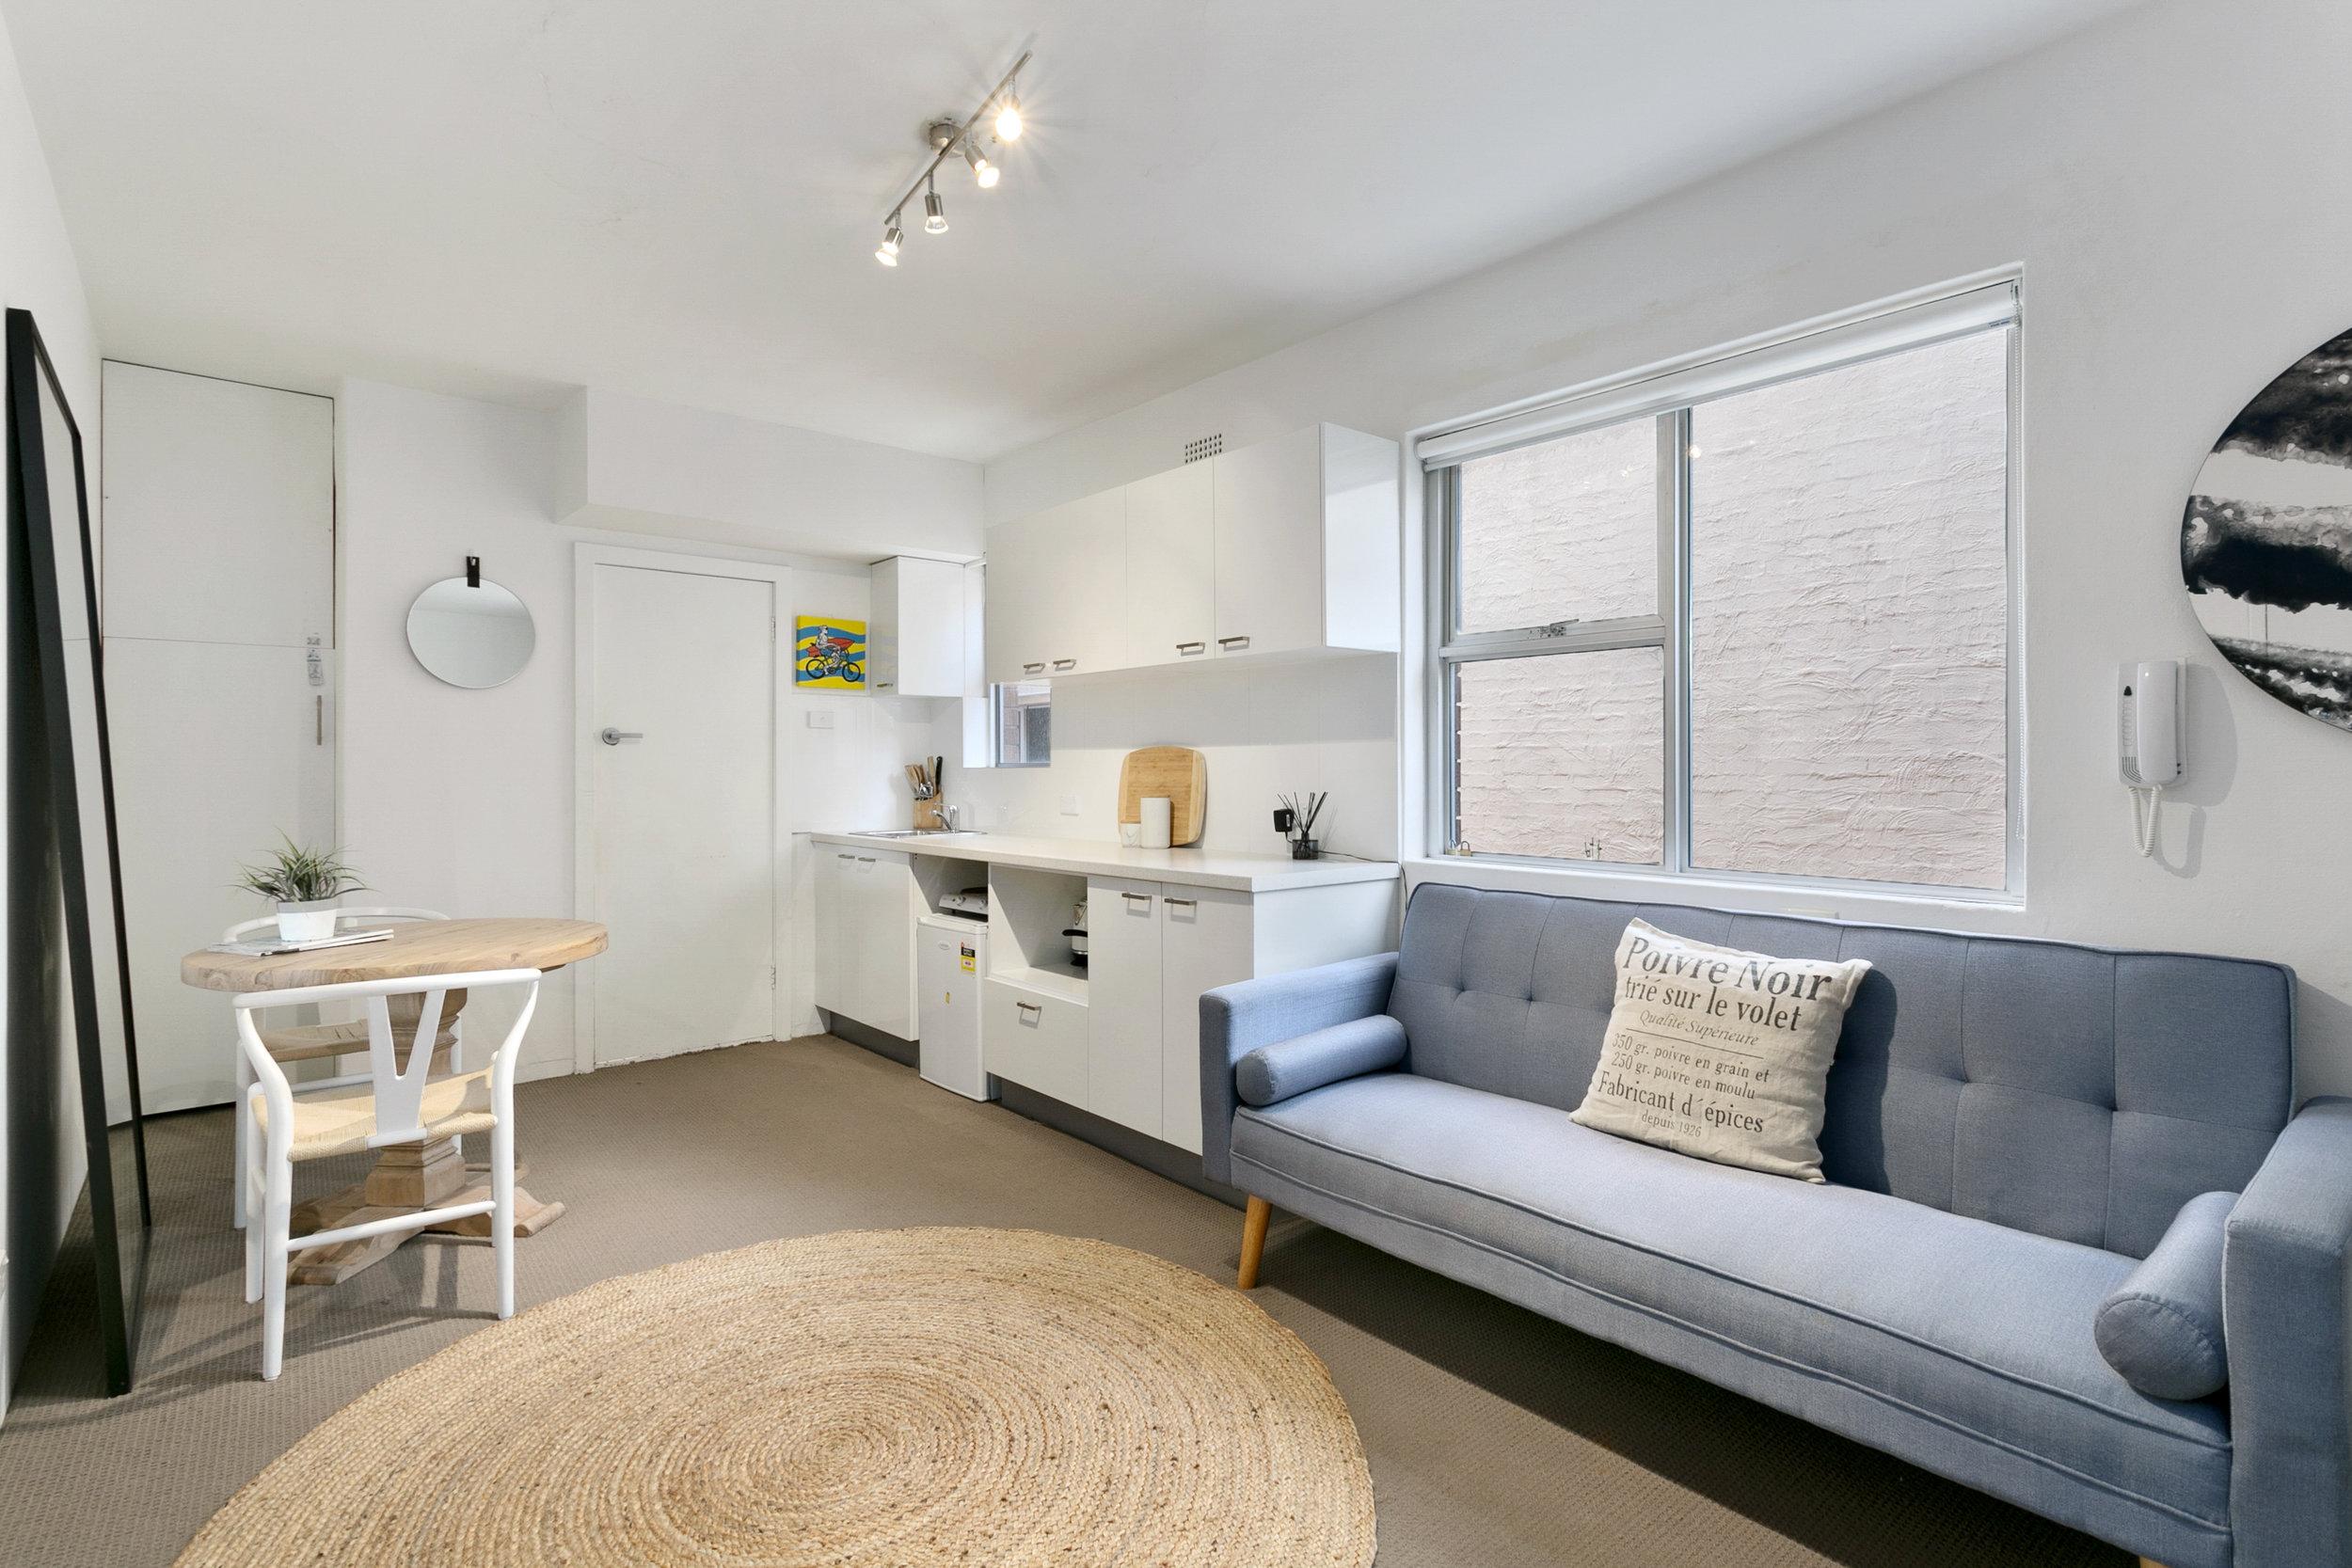 Bondi Beachy beachide apartment. Bondi Beach Holiday Homes.jpg